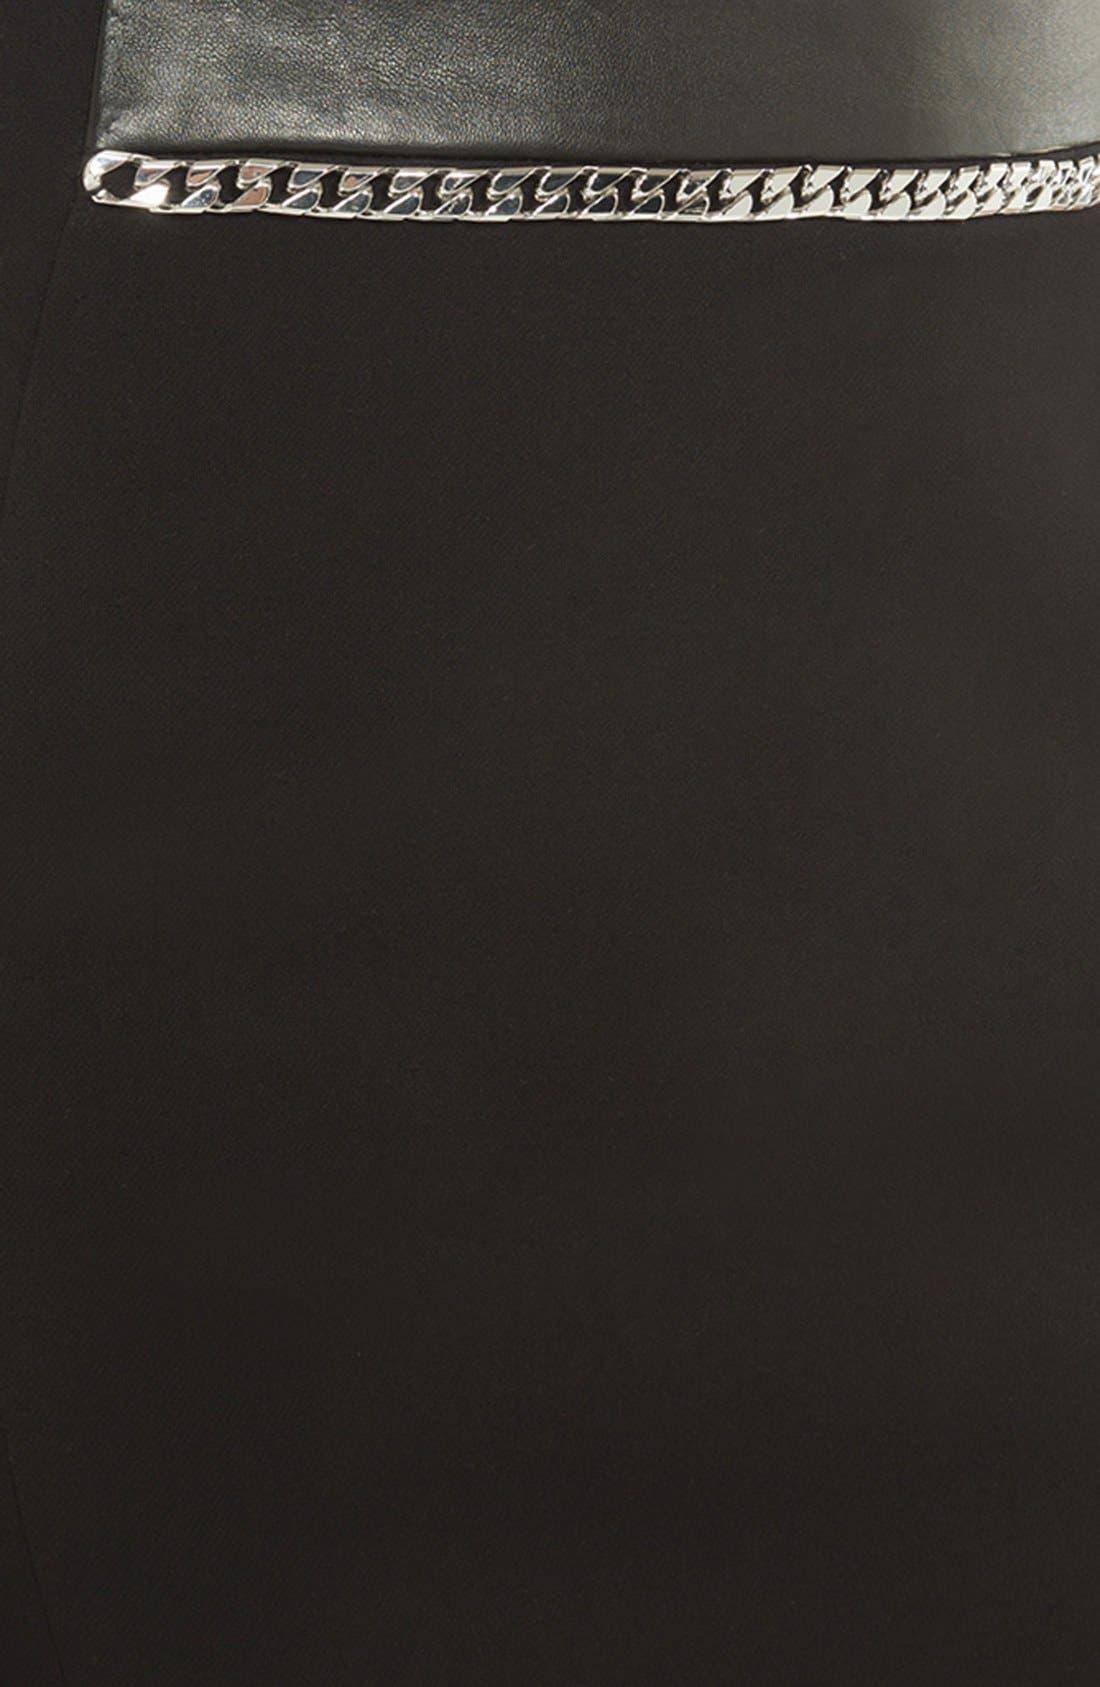 Alternate Image 3  - sandro 'Joyau' Leather & Chain Detail Skirt